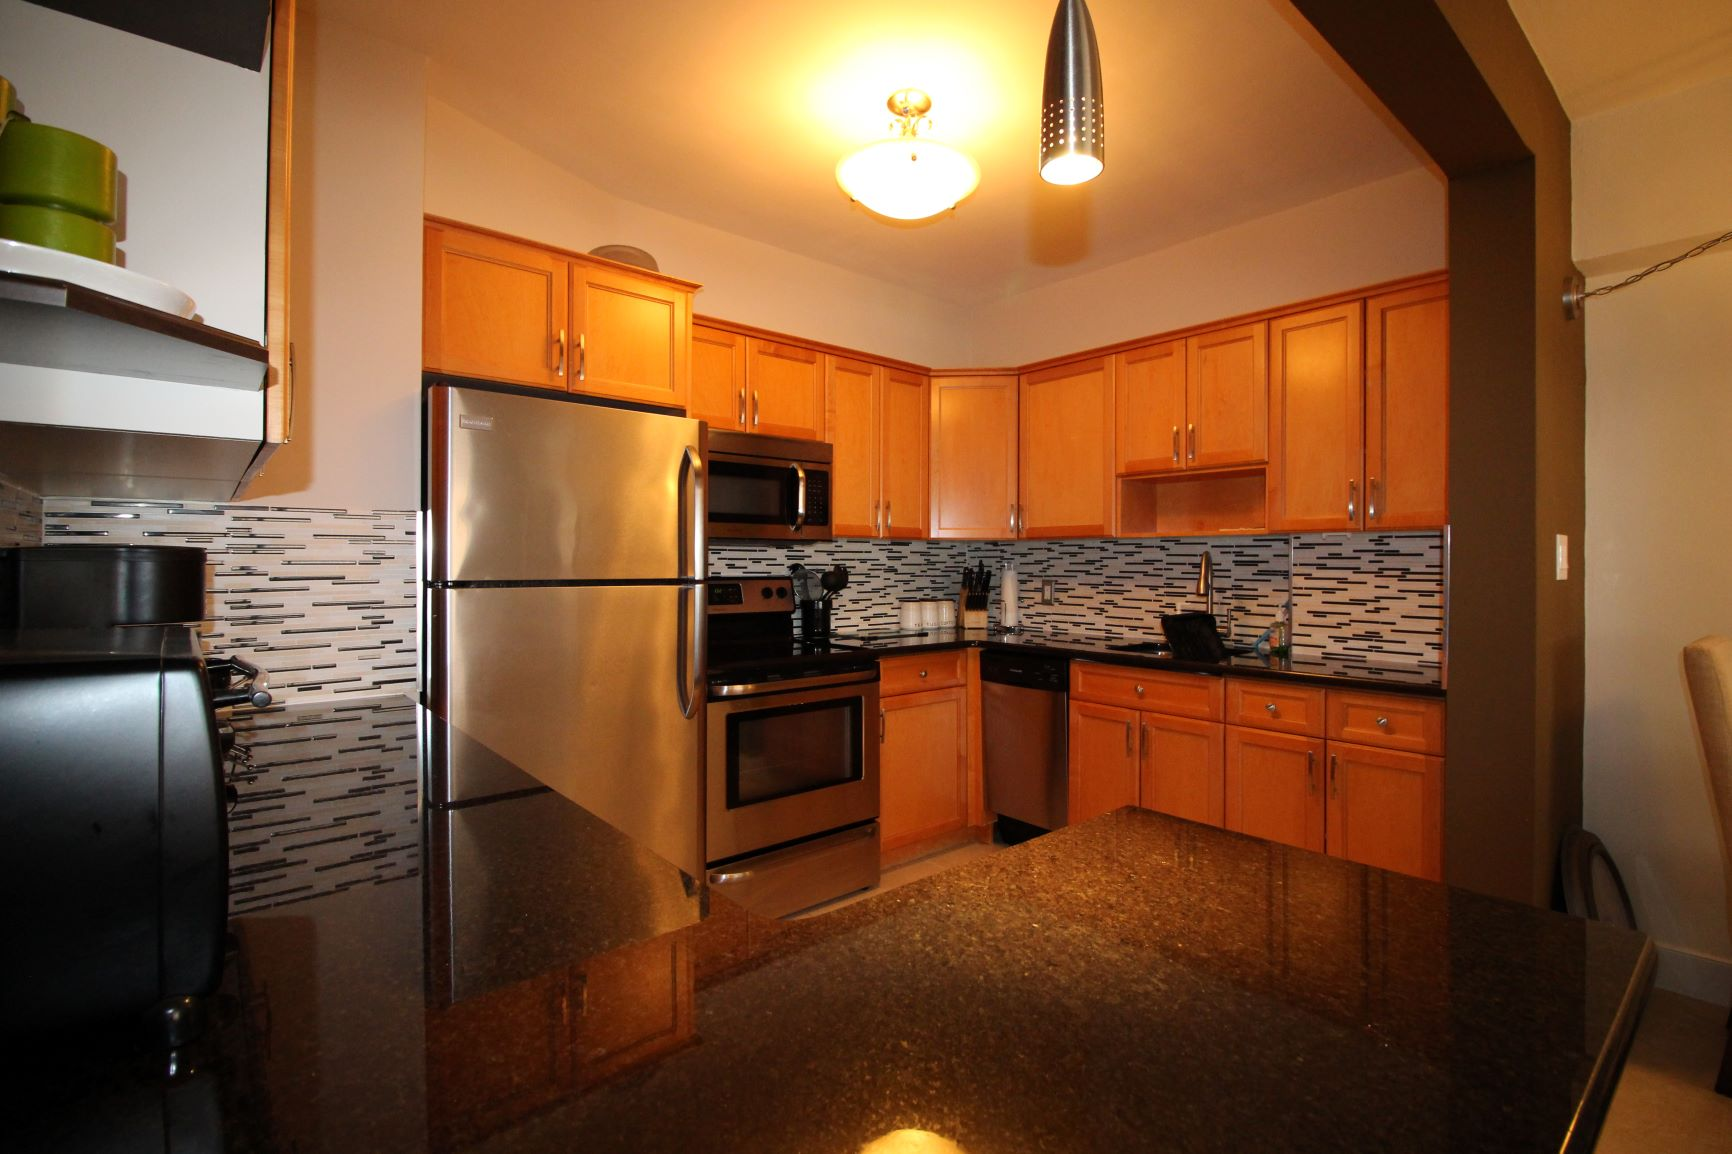 2 Bedrooms, 1 Bathroom, Wellington Crescent, Winnipeg rental, Manitoba rental, executive rental, furnished condo